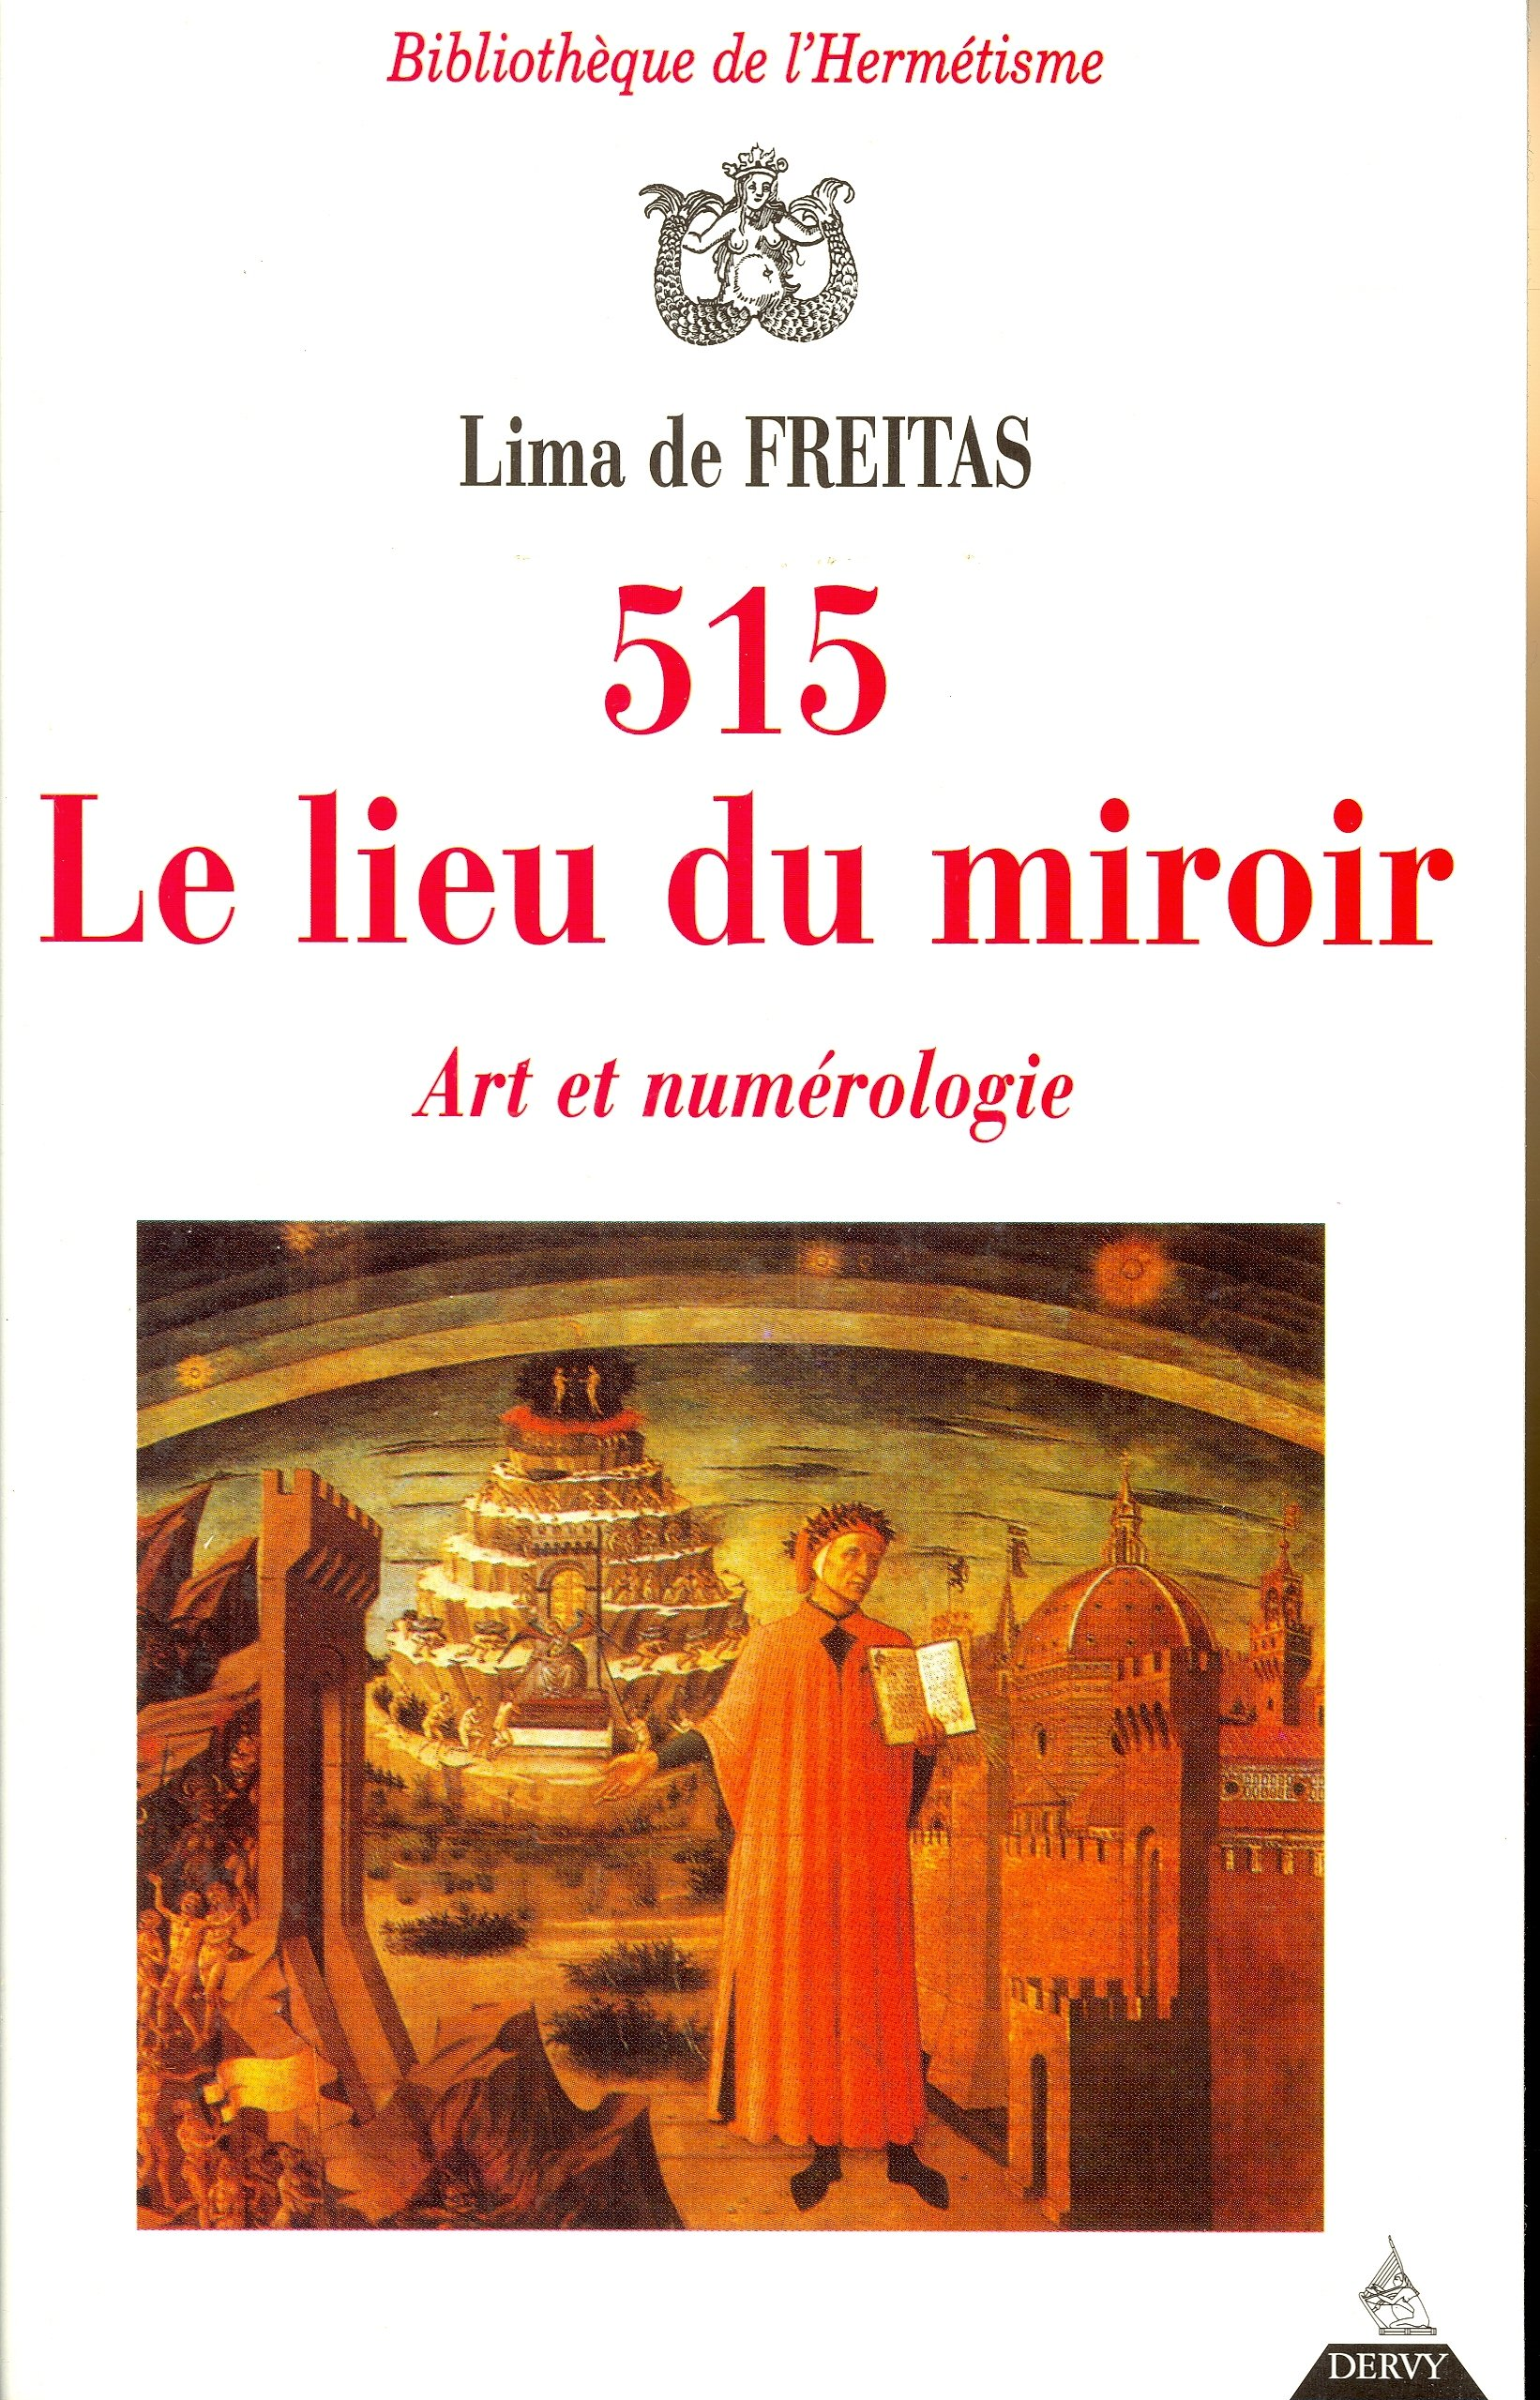 515, Le lieu du miroir Broché – 9 avril 1997 Lima de Freitas Dervy 2850768774 AUK2850768774